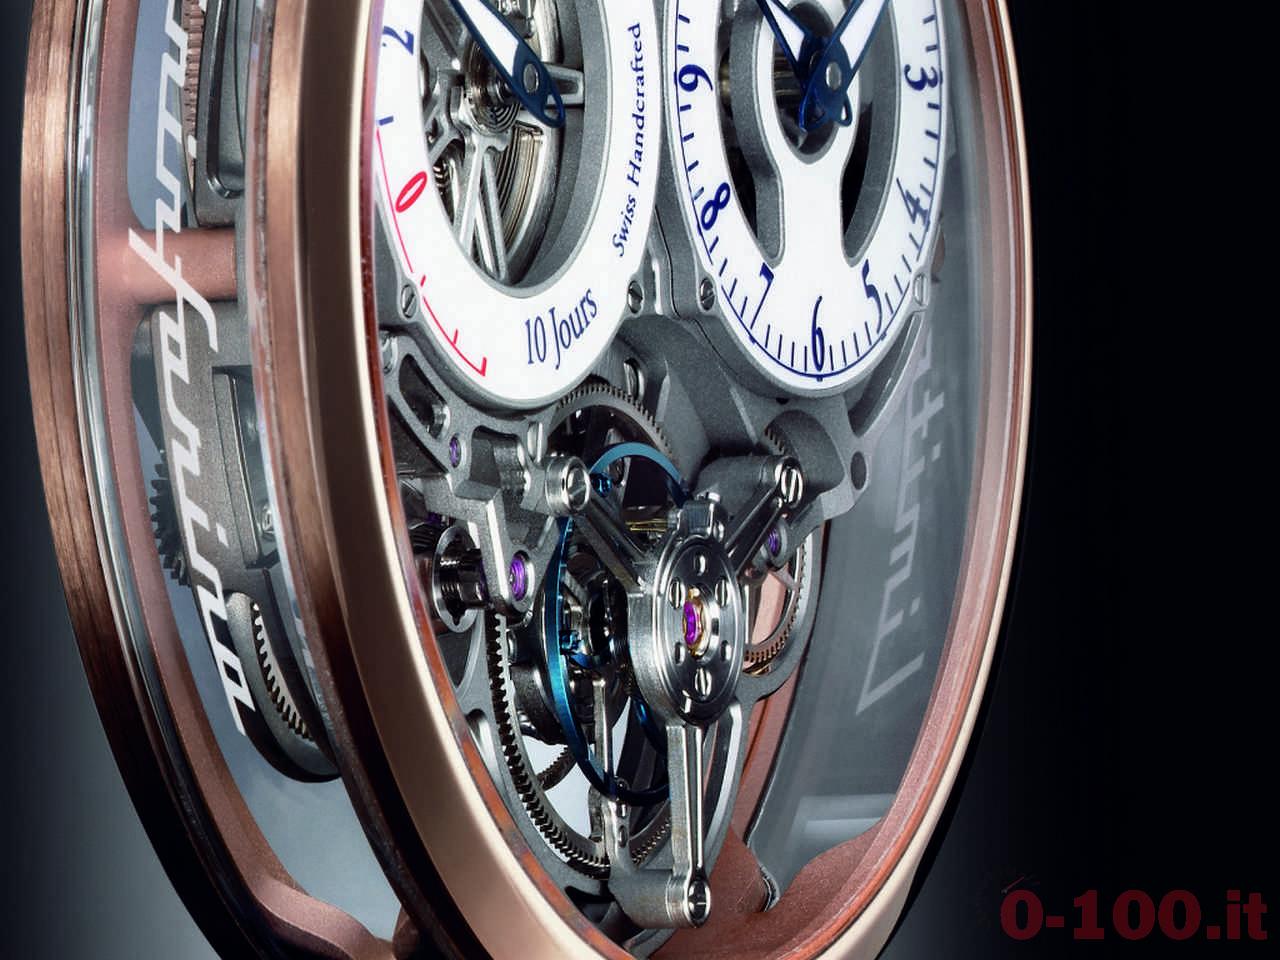 bovet-pininfarina-ottantasei-10-day-tourbillon-limited-edition-prezzo-price_0-1005